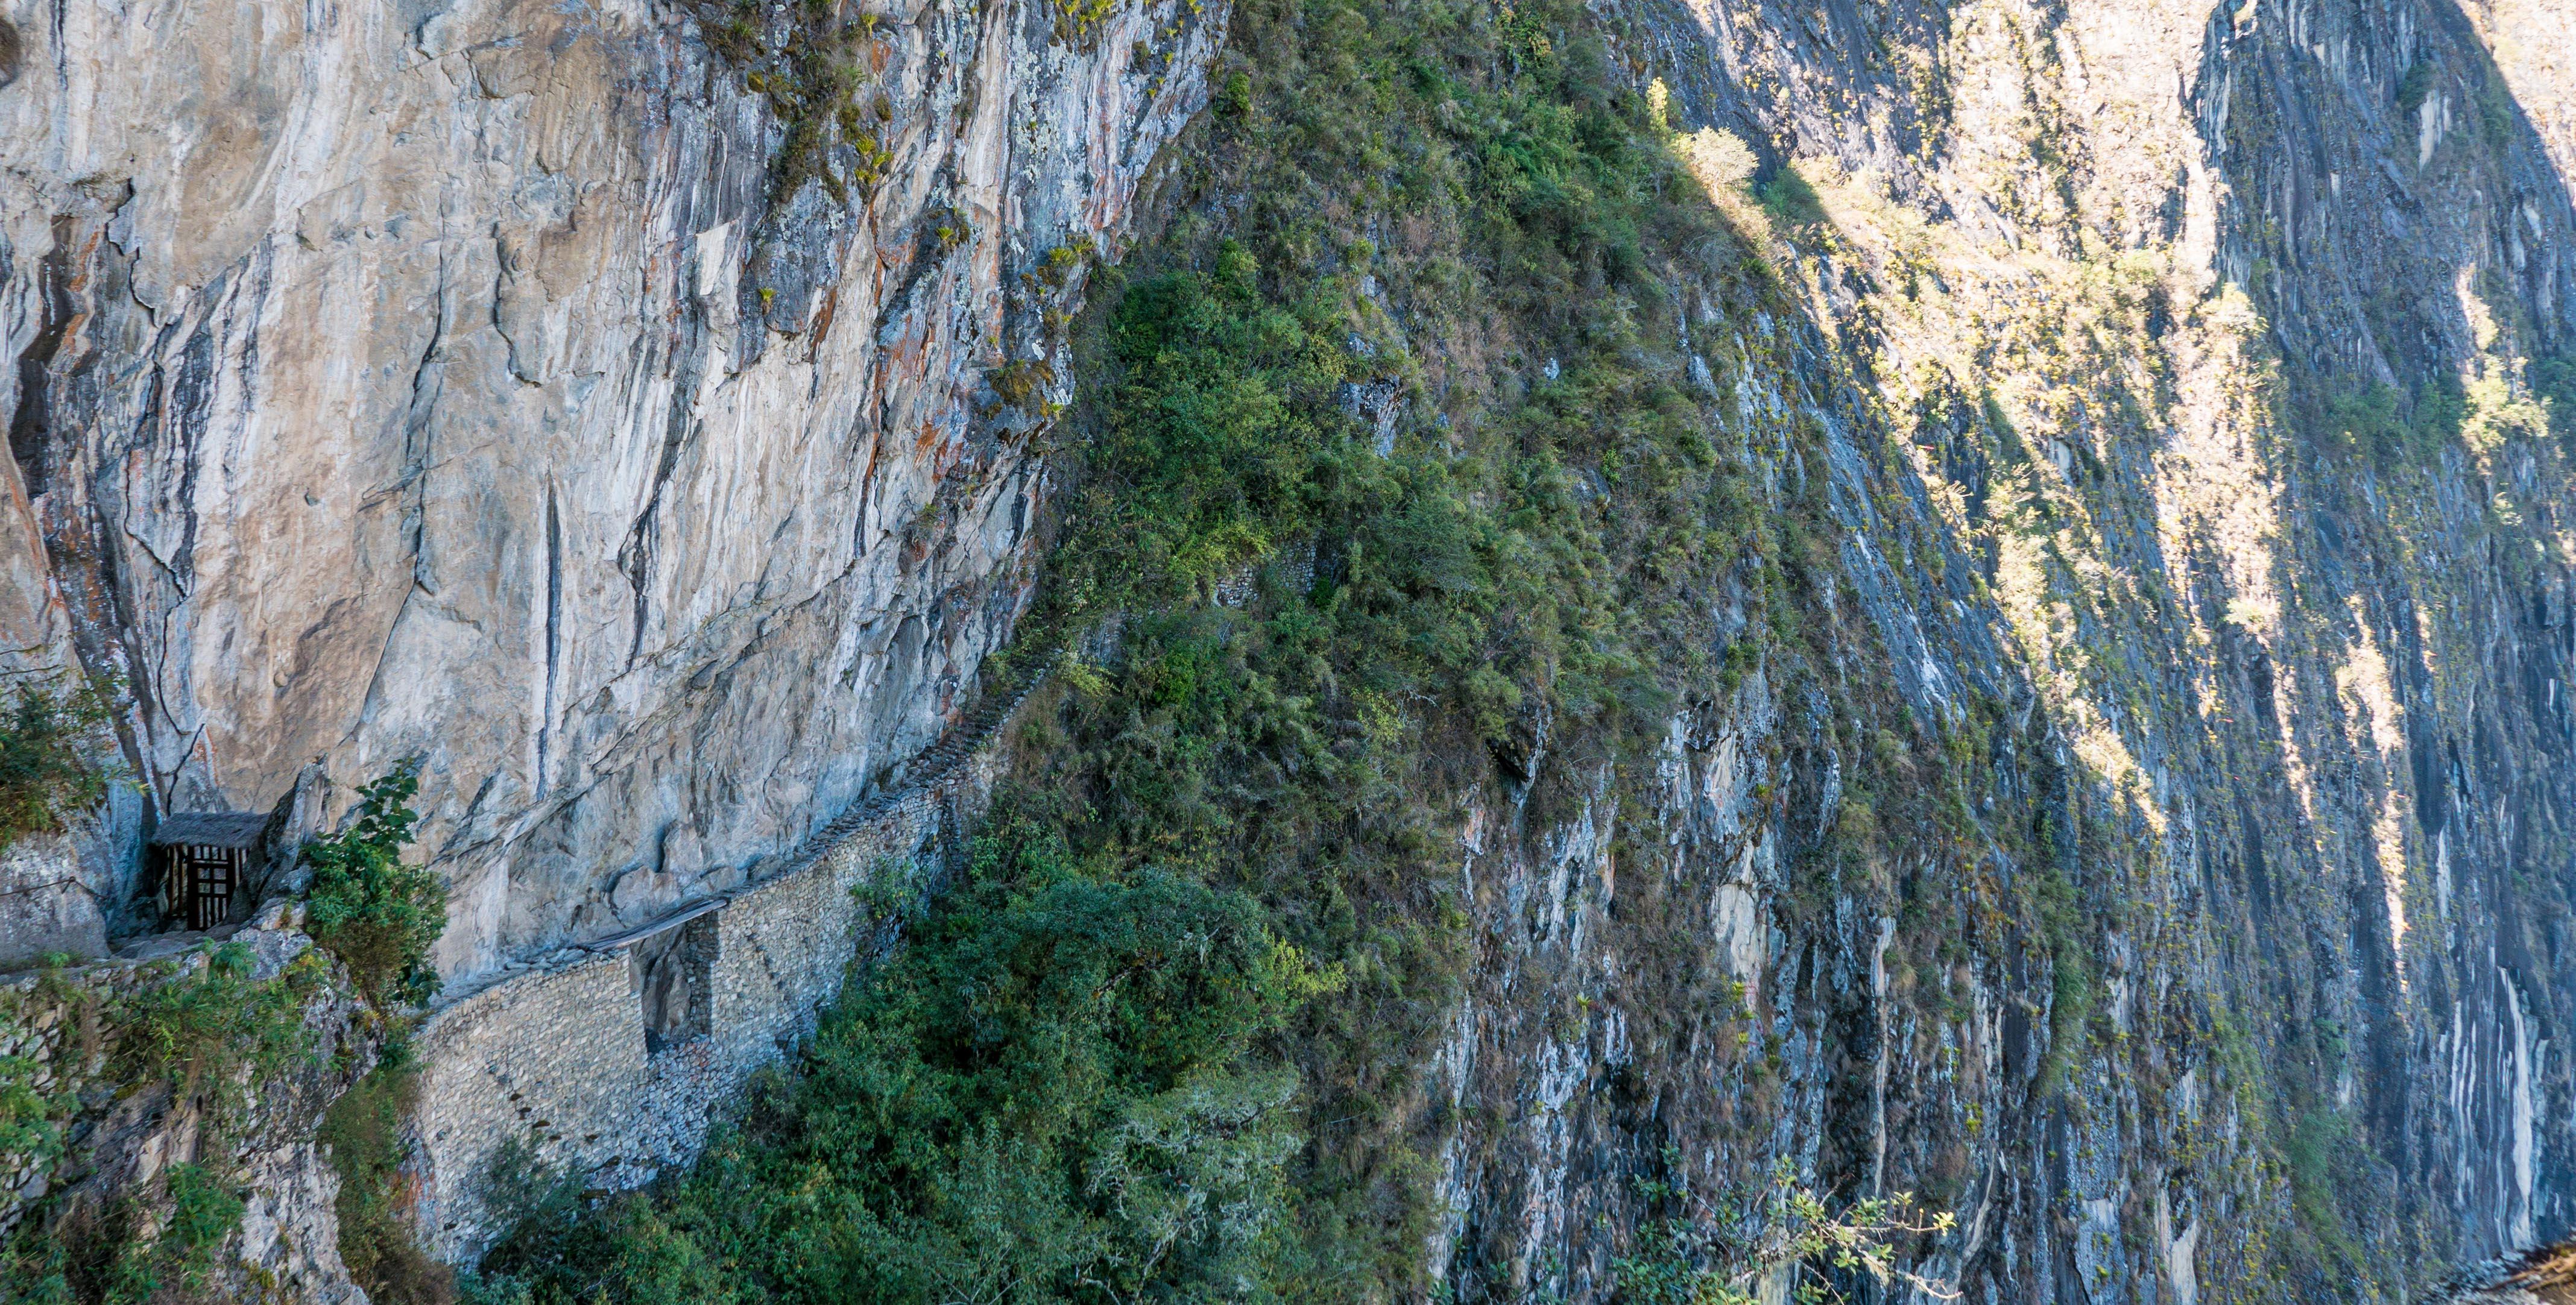 The Inka Bridge